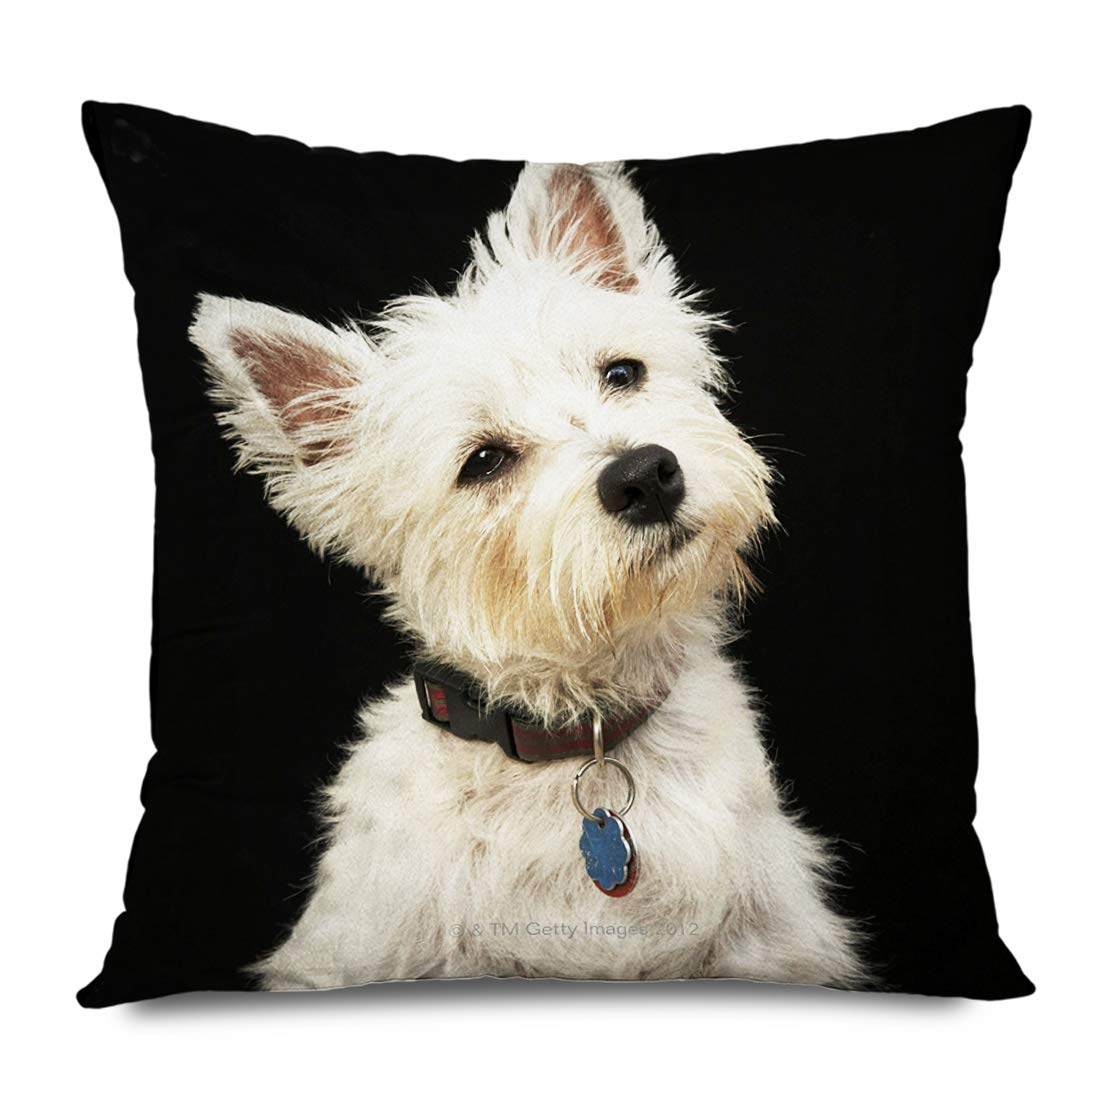 Ahawoso Throw Pillow Cover Square 18x18 Inches Vws Jg Westie West Highland Terrier Collar Cushion Case Home Decor Zippered Pillowcase